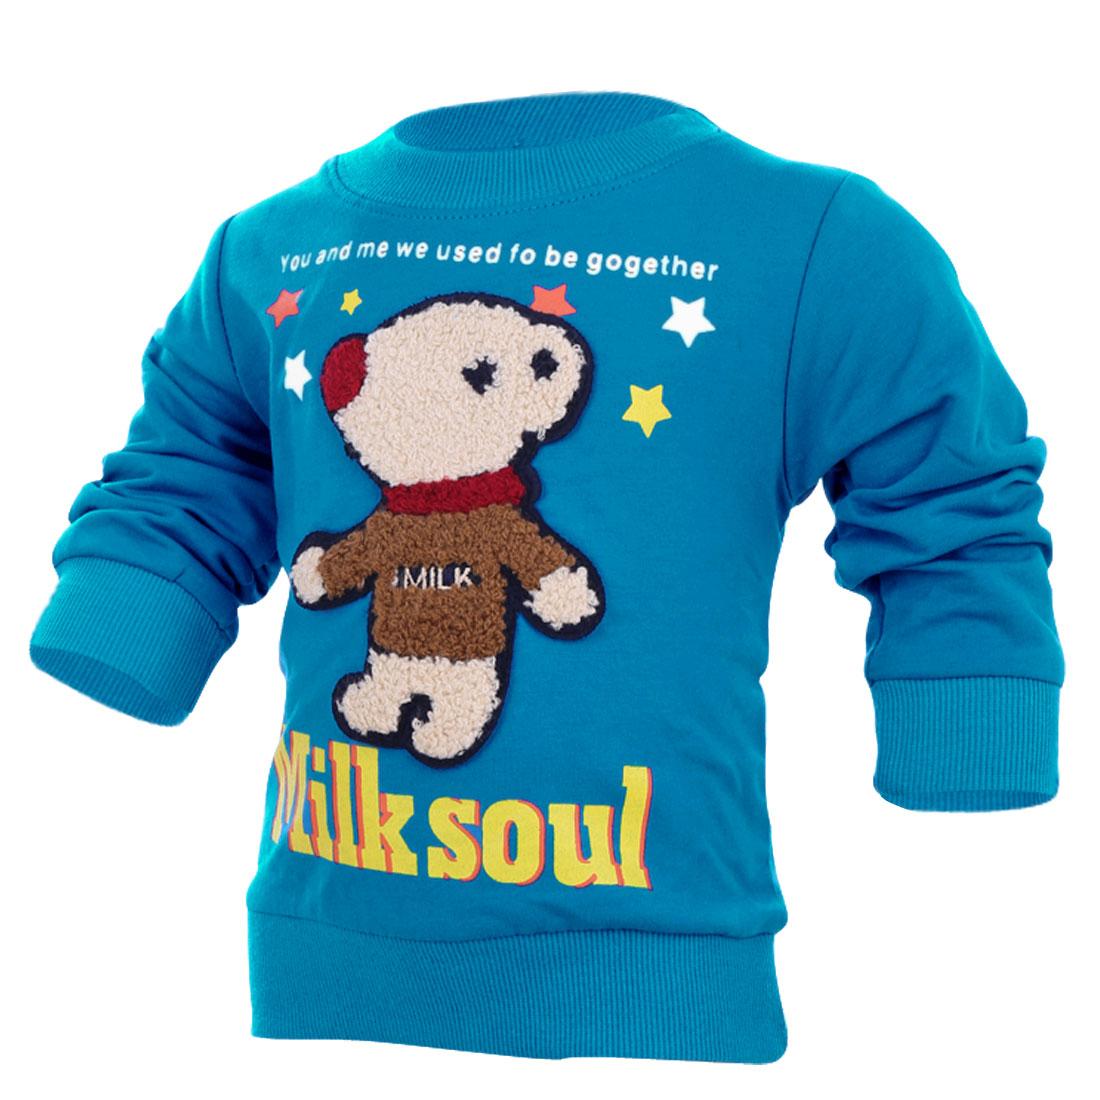 Pullover Lovely Letters Pattern Long-Sleeved Blue Spring Top Shirt for Kids 4